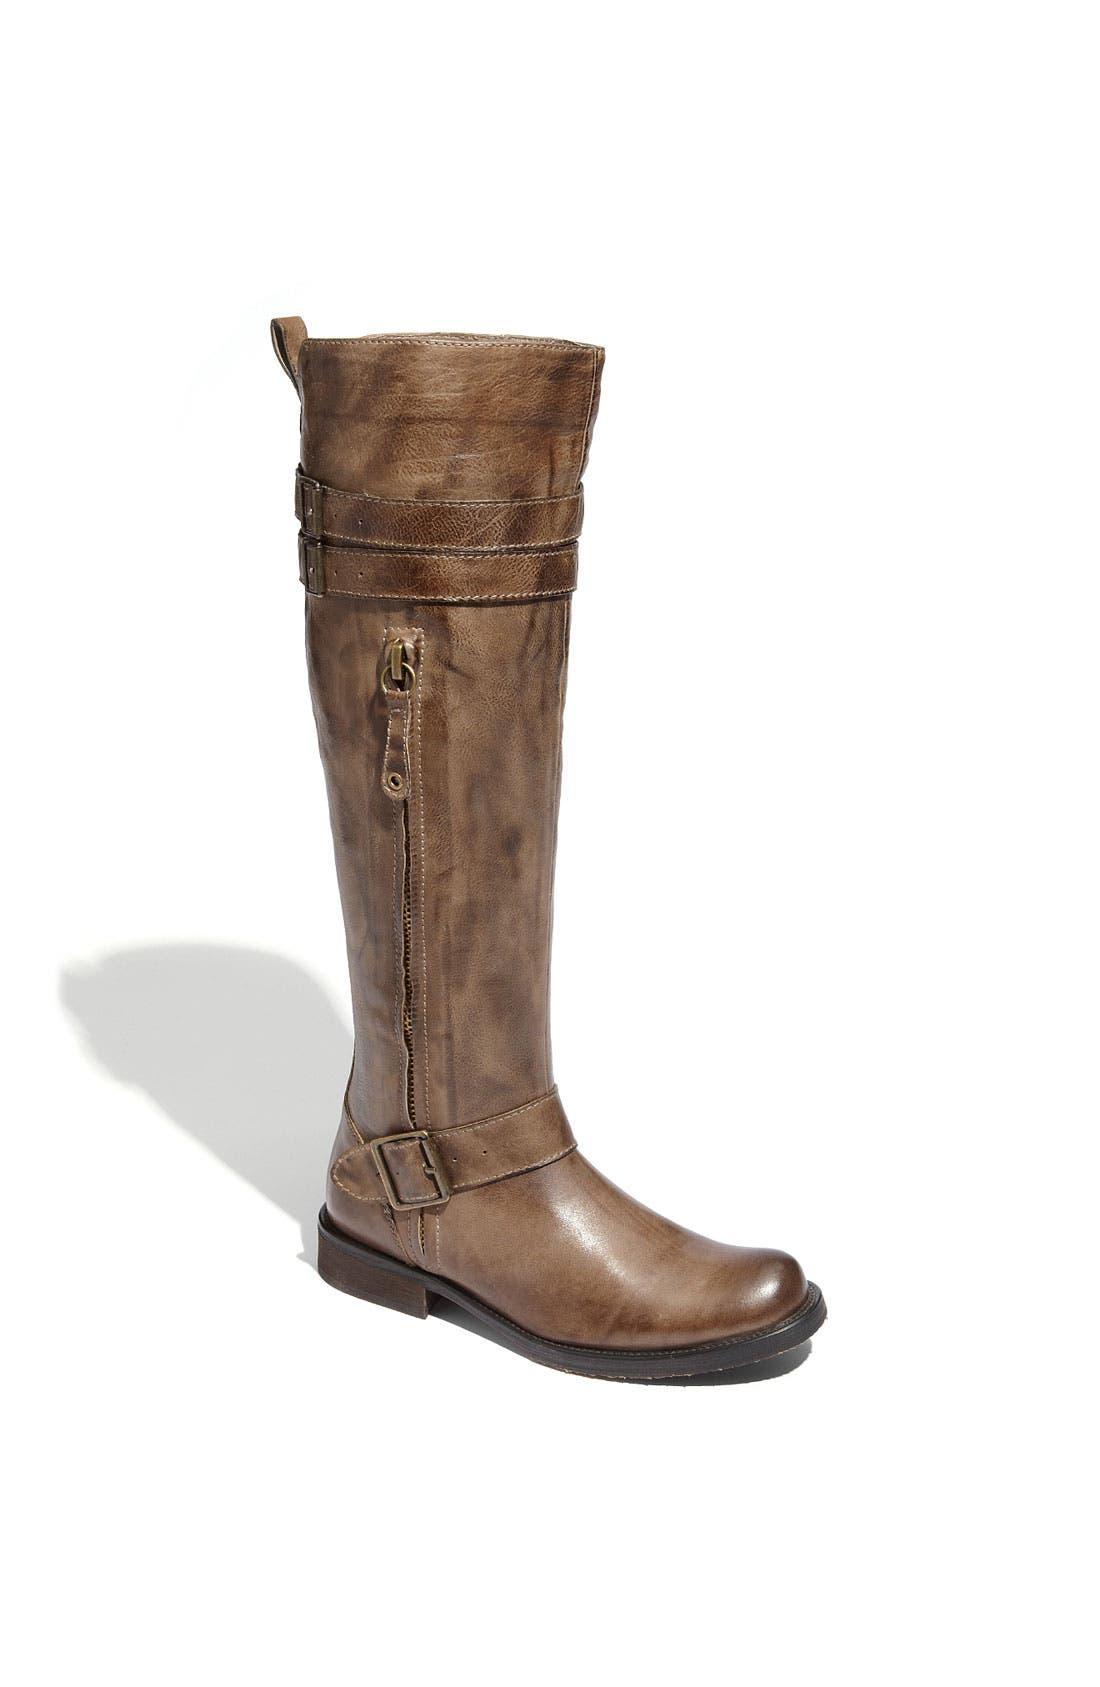 Alternate Image 1 Selected - Miz Mooz 'Kellen' Boot